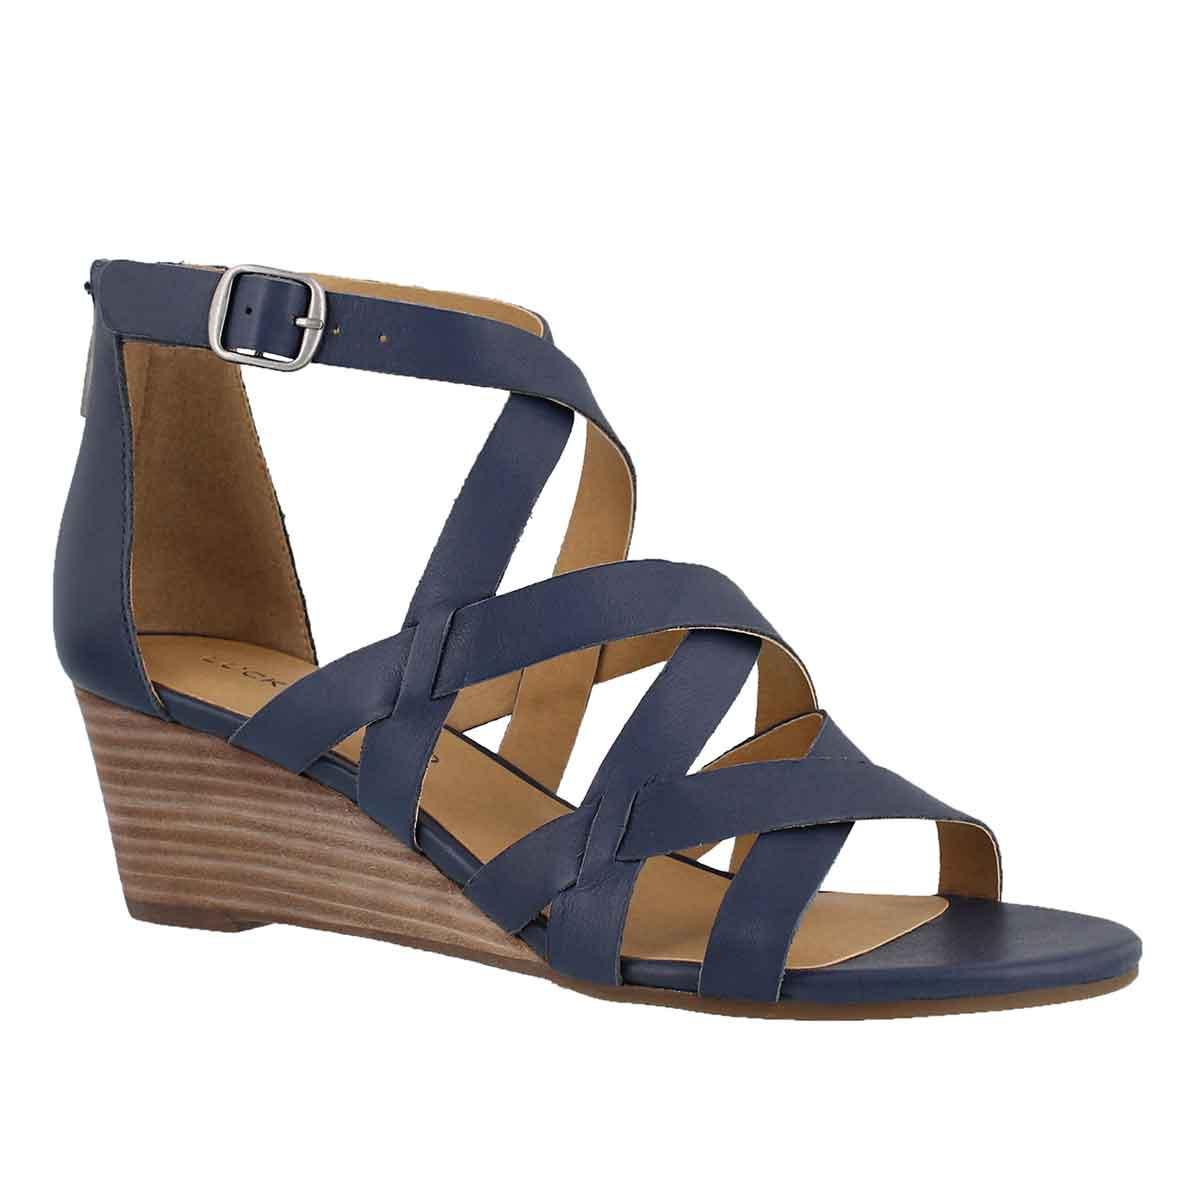 Women's JEWELIA indigo wedge sandal